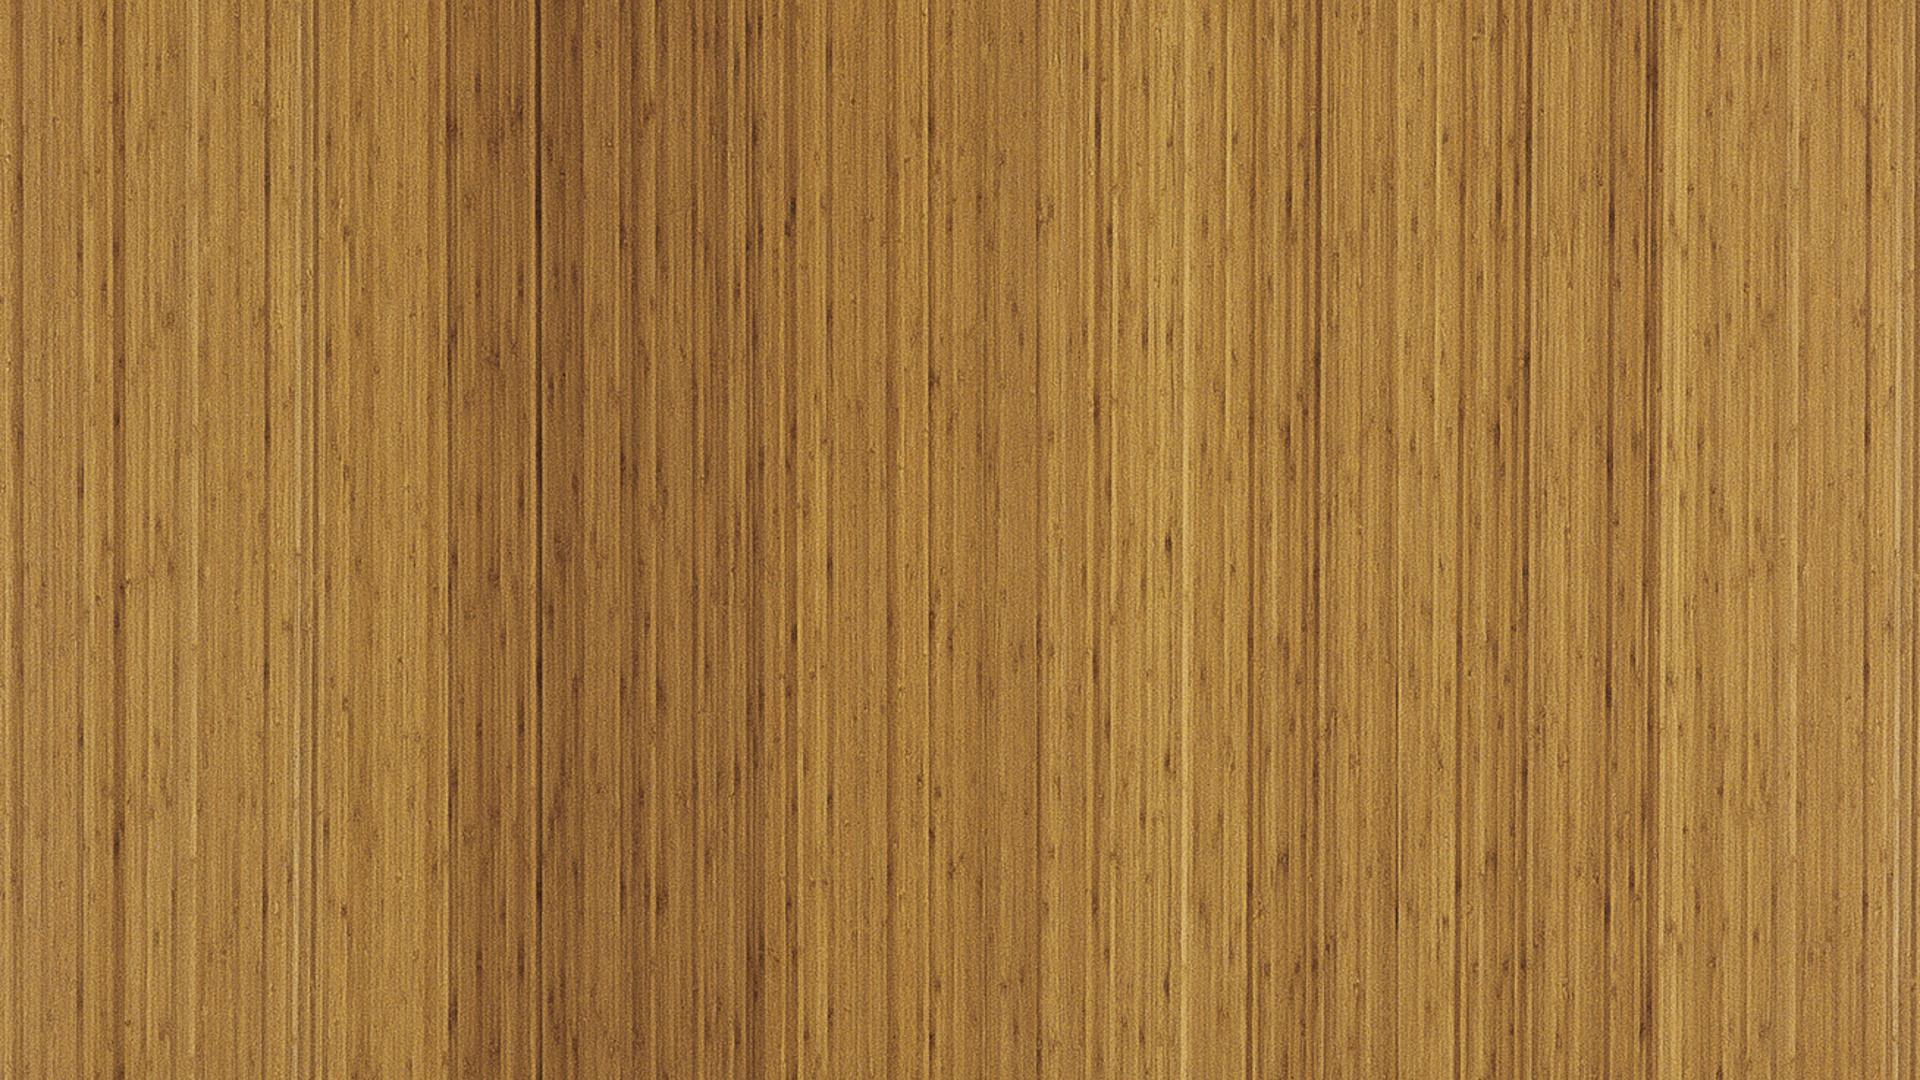 Super Bambus Karamell - Furnier | KAINDL ZL36